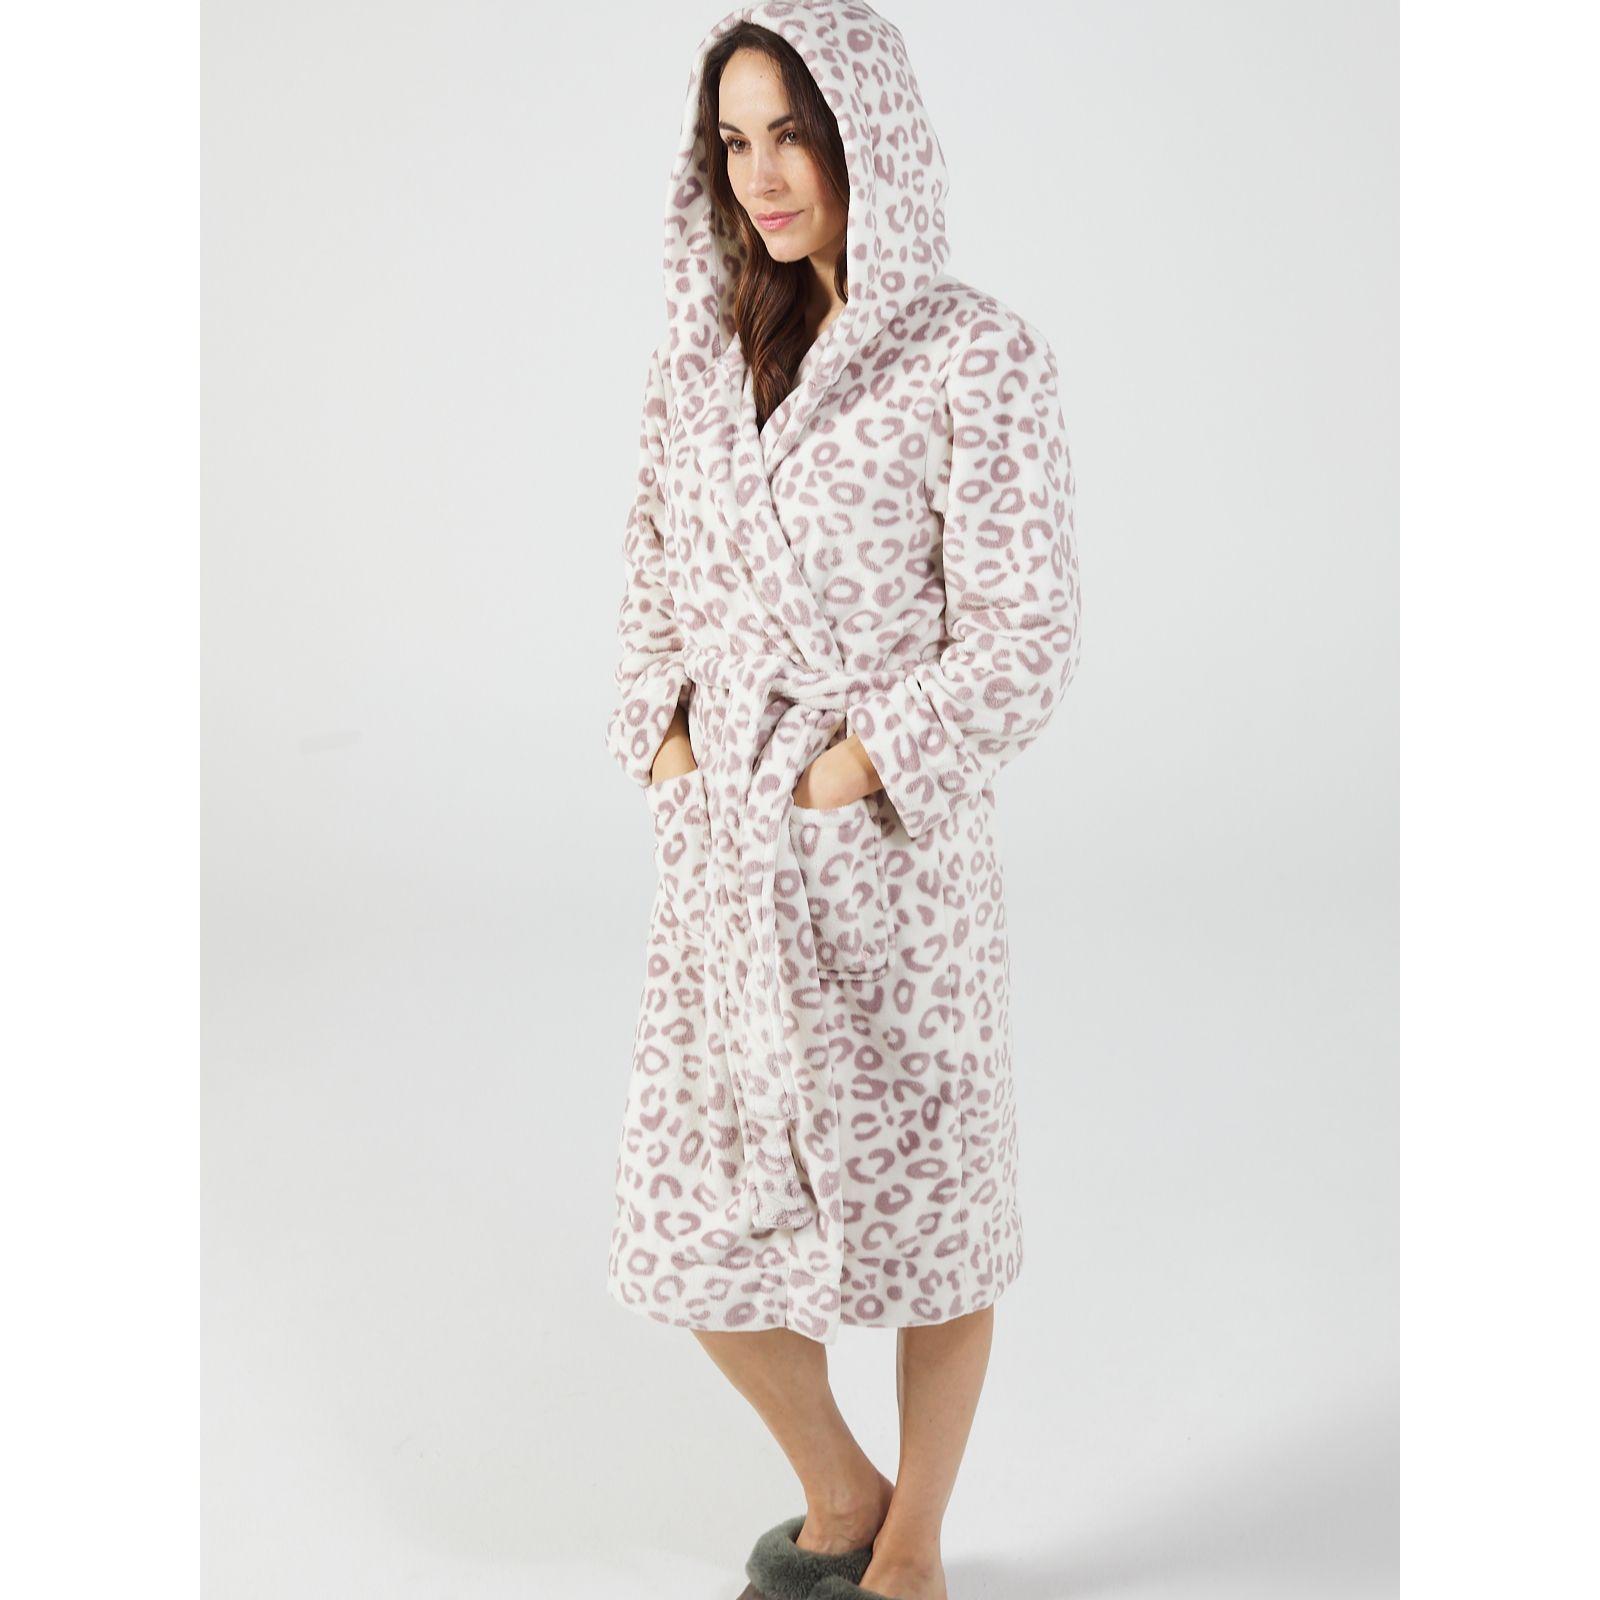 d36e31ad6e9 Joules Rita Hooded Fleece Dressing Gown - QVC UK